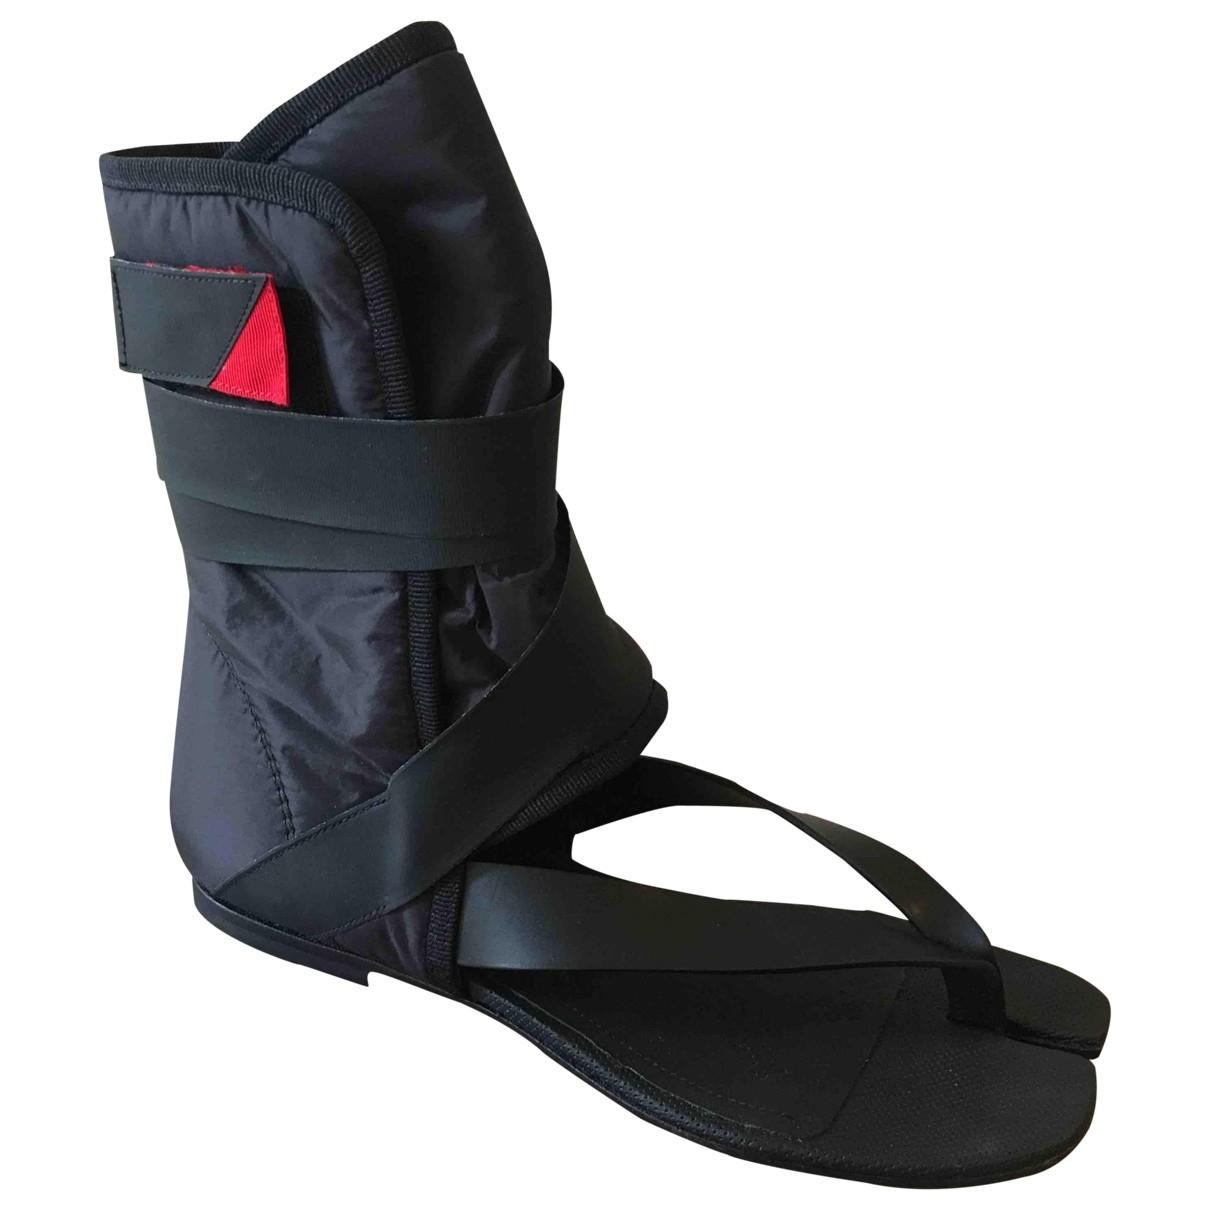 Maison Martin Margiela Tabi Black Leather Sandals for Women 35 EU